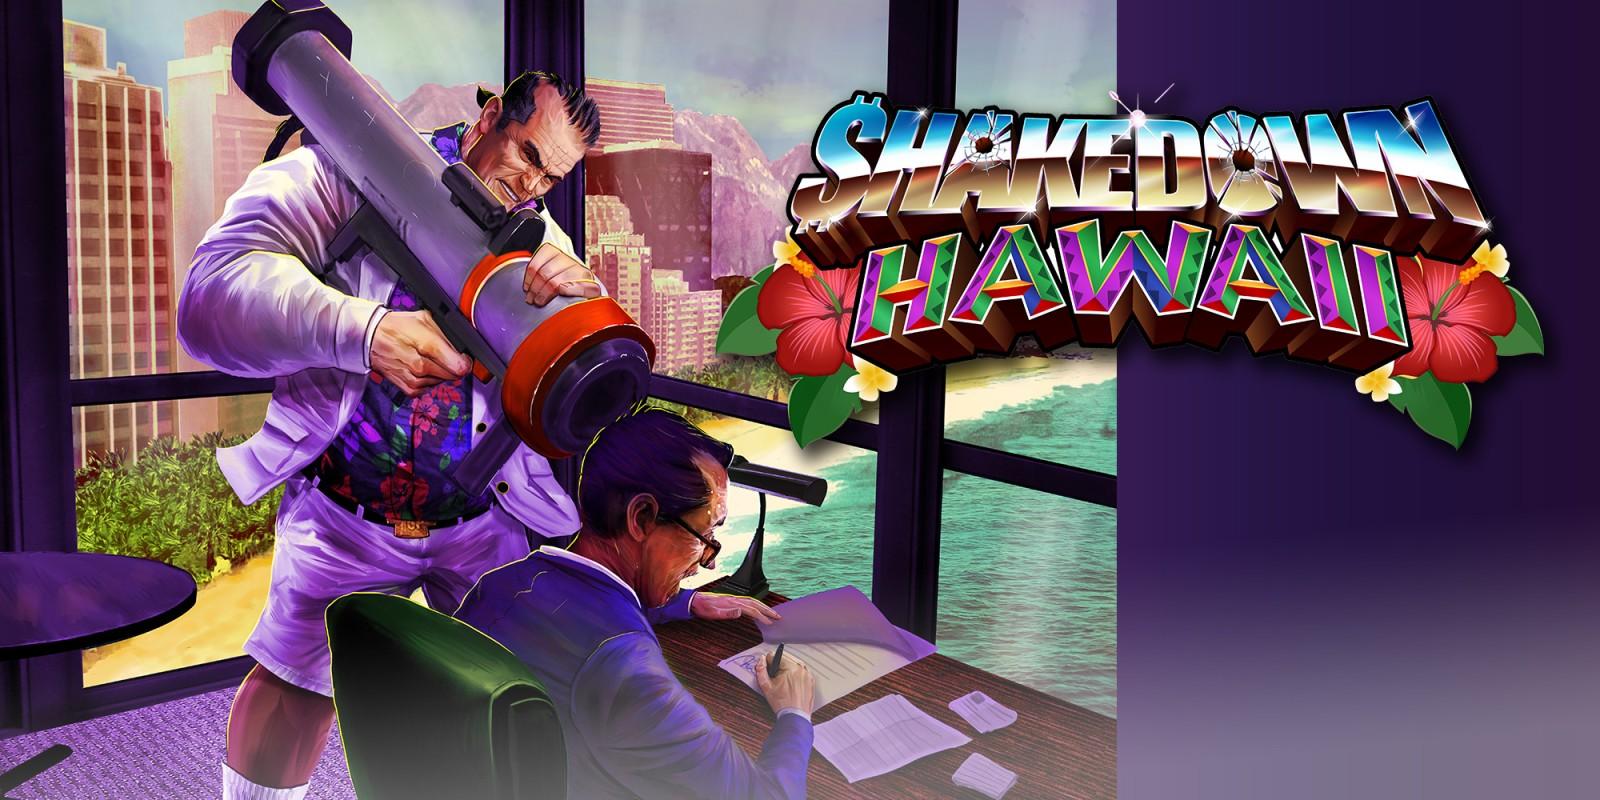 Shakedown: Hawaii finalmente in arrivo, l'uscita è imminente